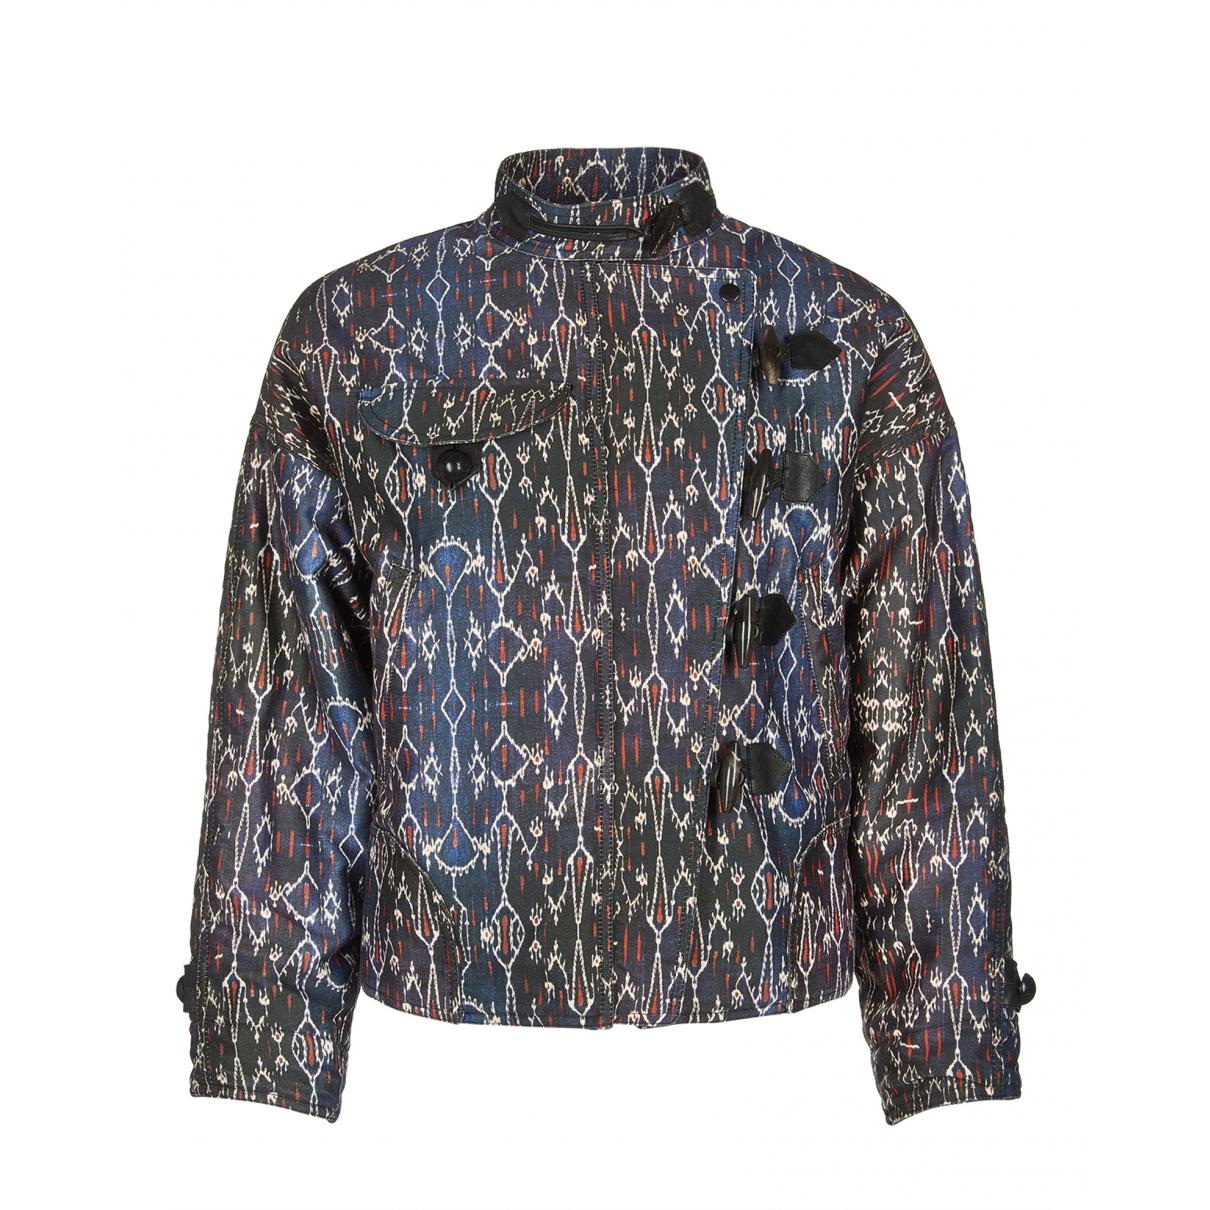 Isabel Marant N Blue Cotton jacket for Women 6 UK